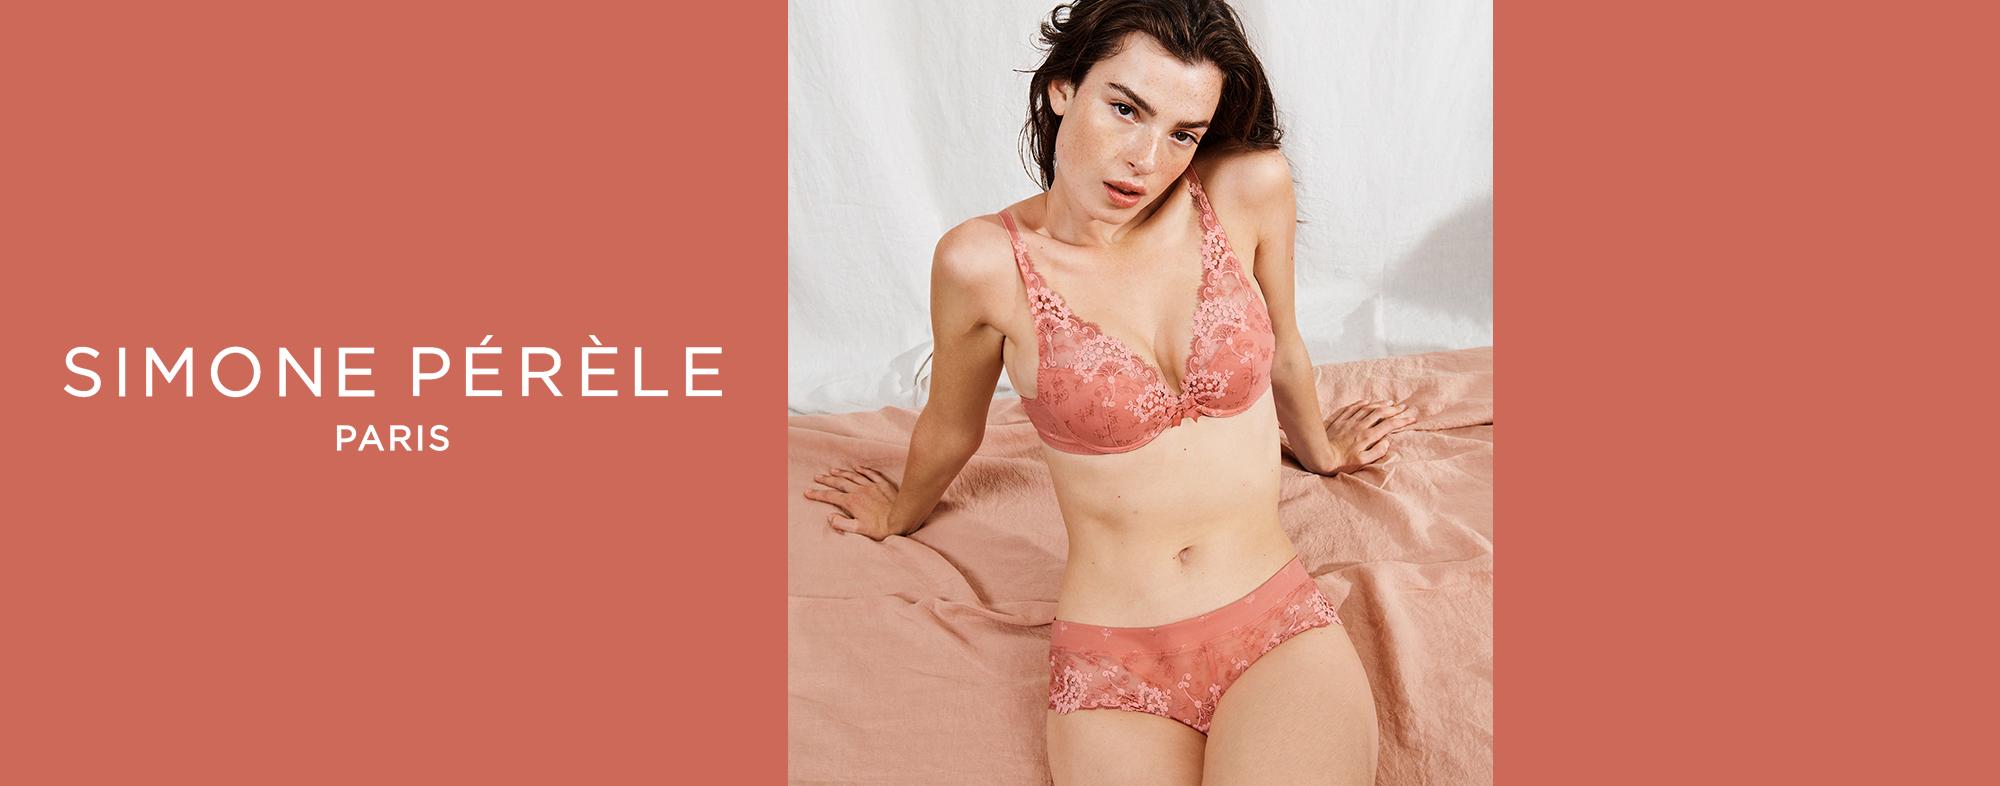 Simone Perele - Wish